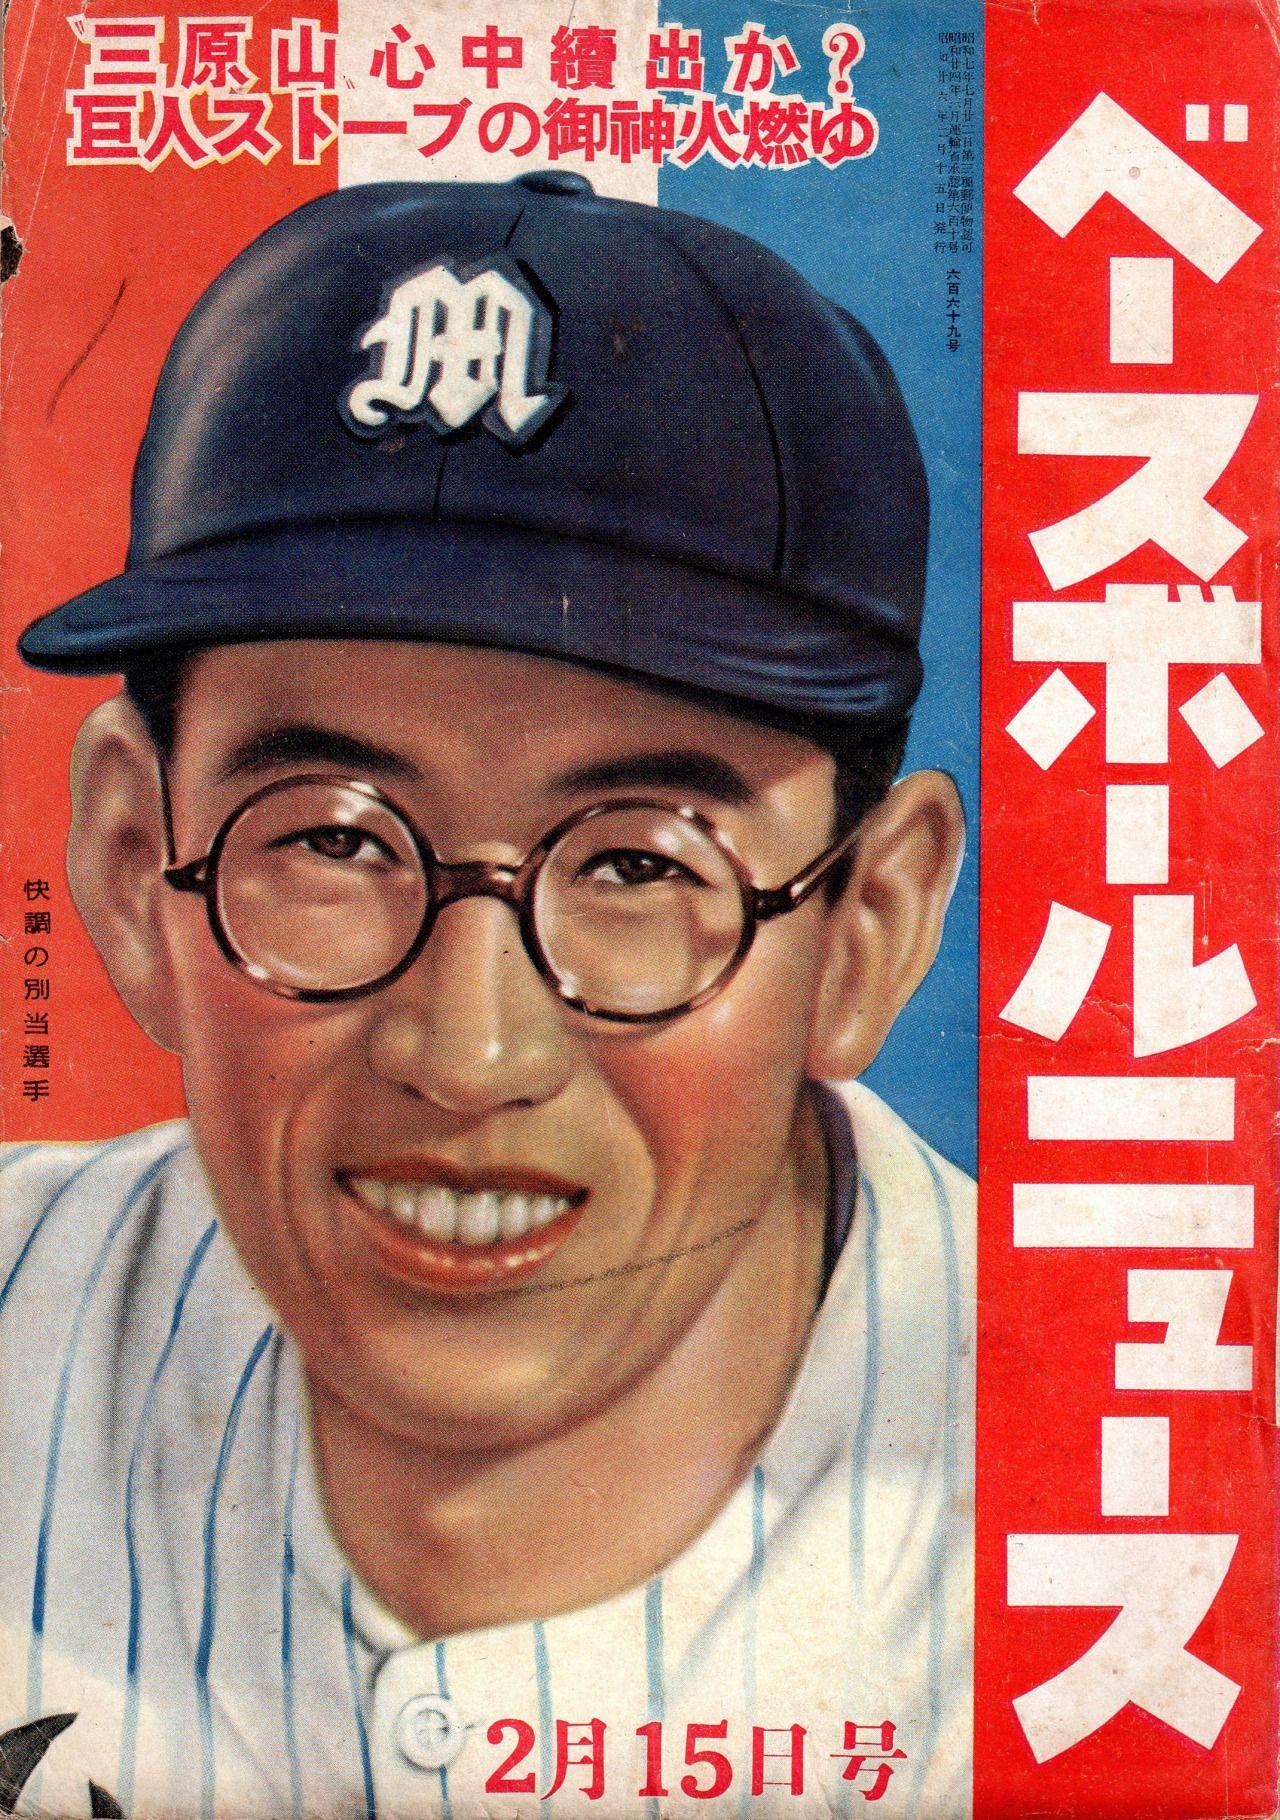 Finger Five! — Kaoru Betto - Baseball News 1950 or 51 He hit .335...